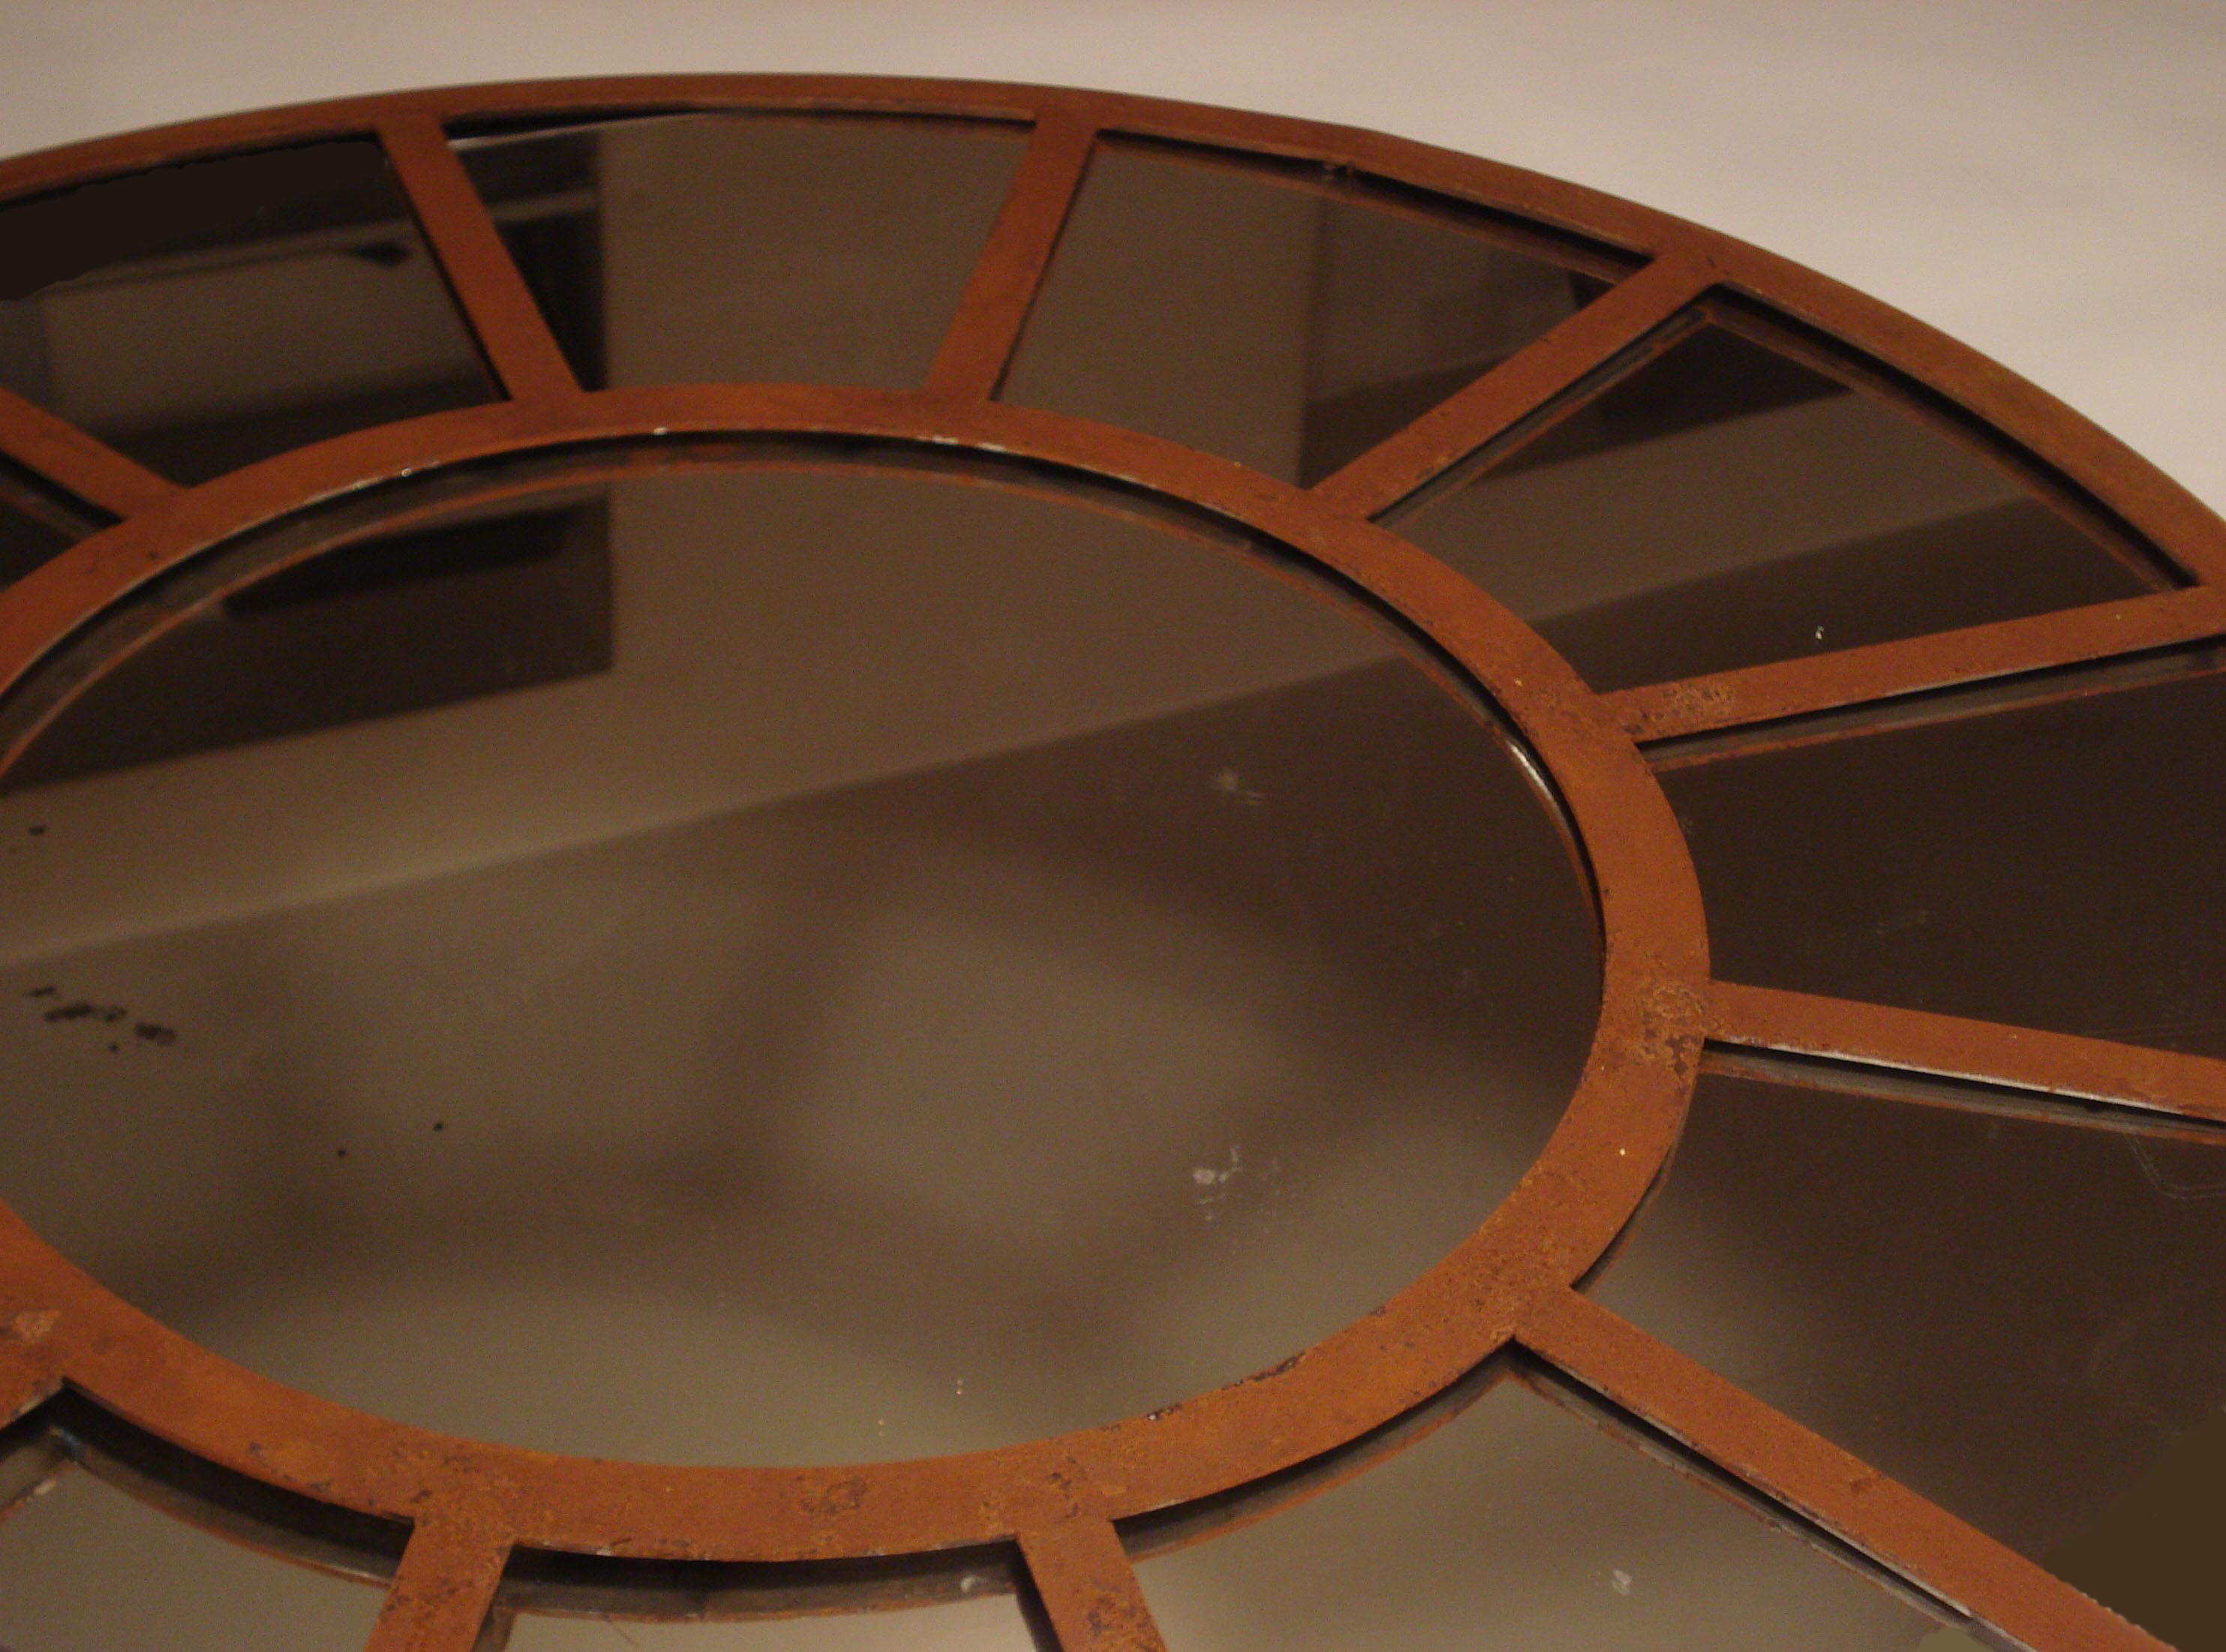 miroir oeil de boeuf. Black Bedroom Furniture Sets. Home Design Ideas